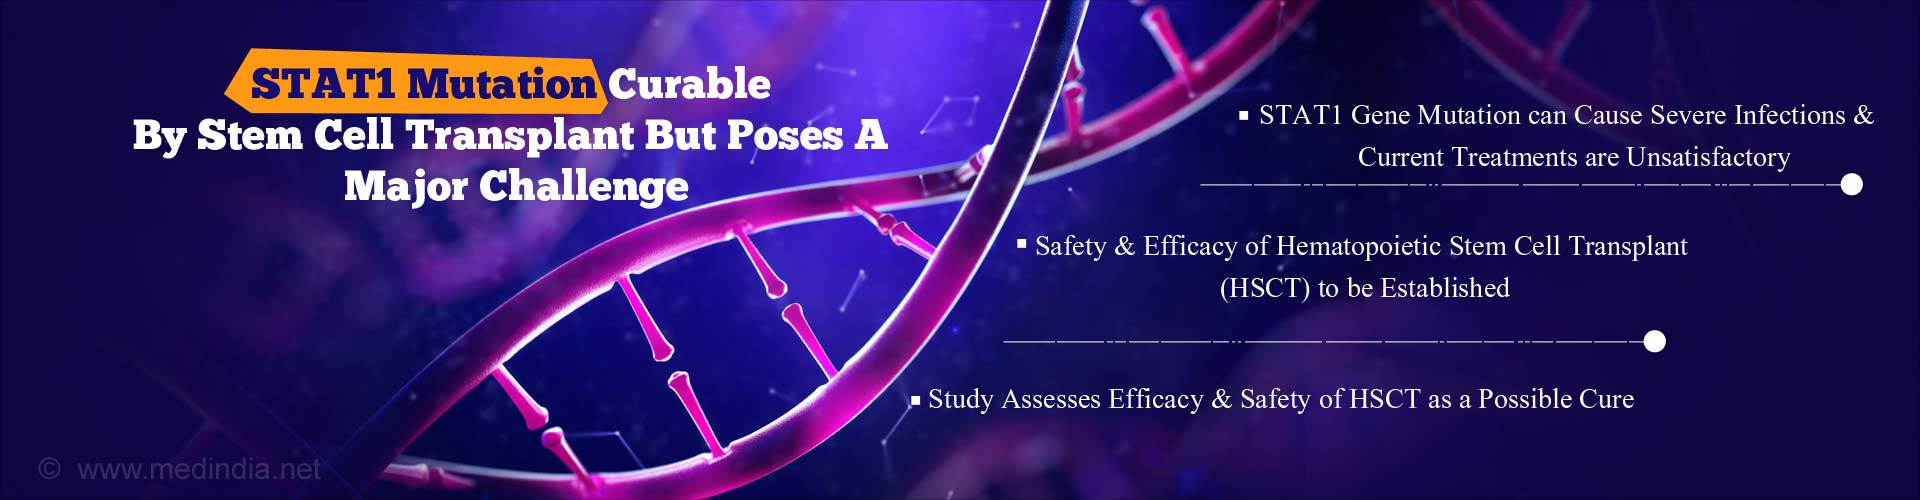 Hematopoietic Stem Cell Transplant For STAT1 Gene Mutation - Promising But Risky